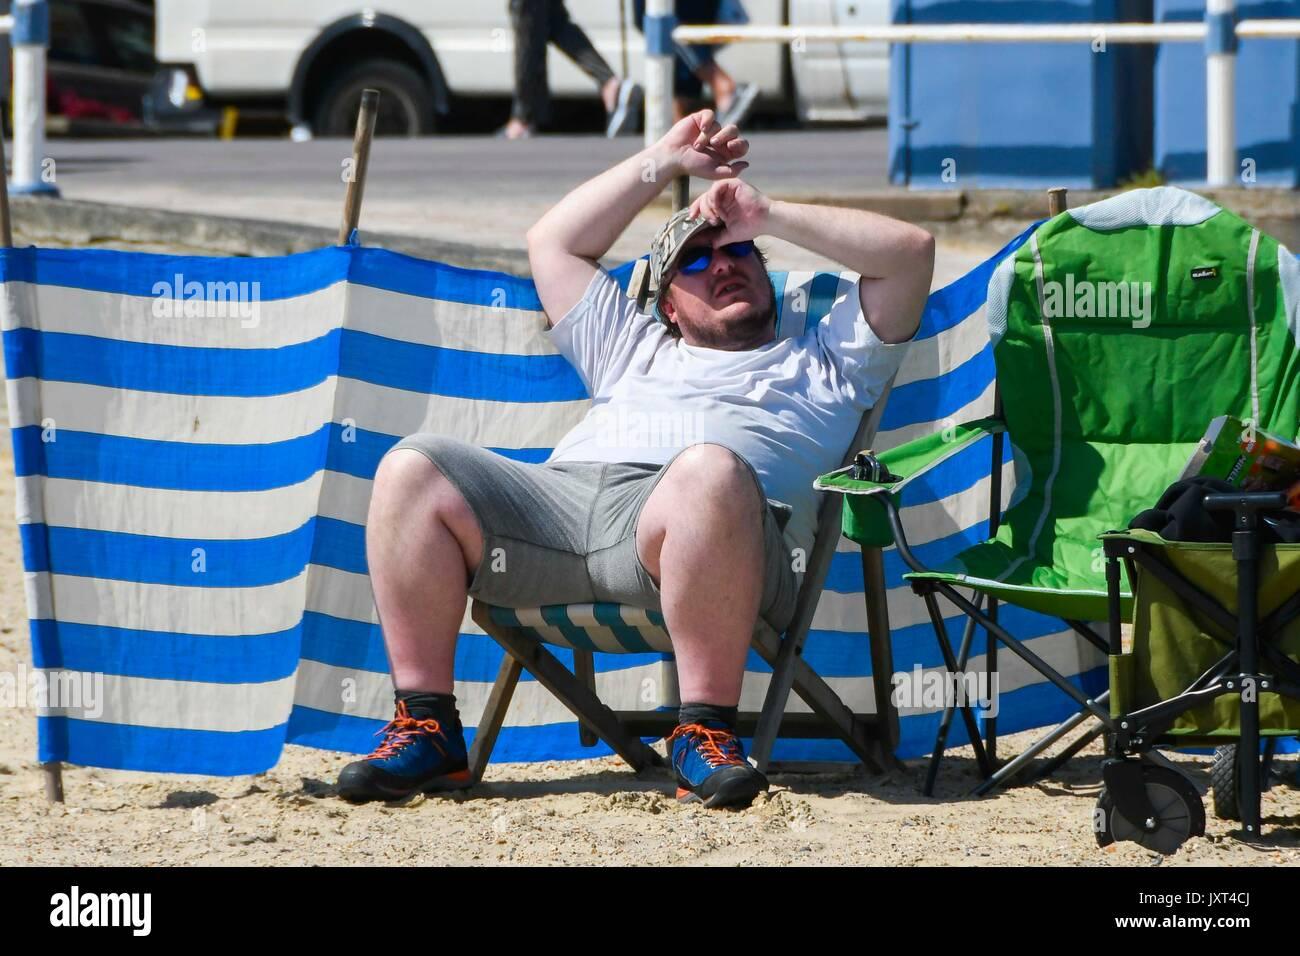 Weymouth, Dorset, UK. 17th Aug, 2017. UK Weather. Holidaymakers and sunbathers on the beach enjoying the warm sunny Stock Photo